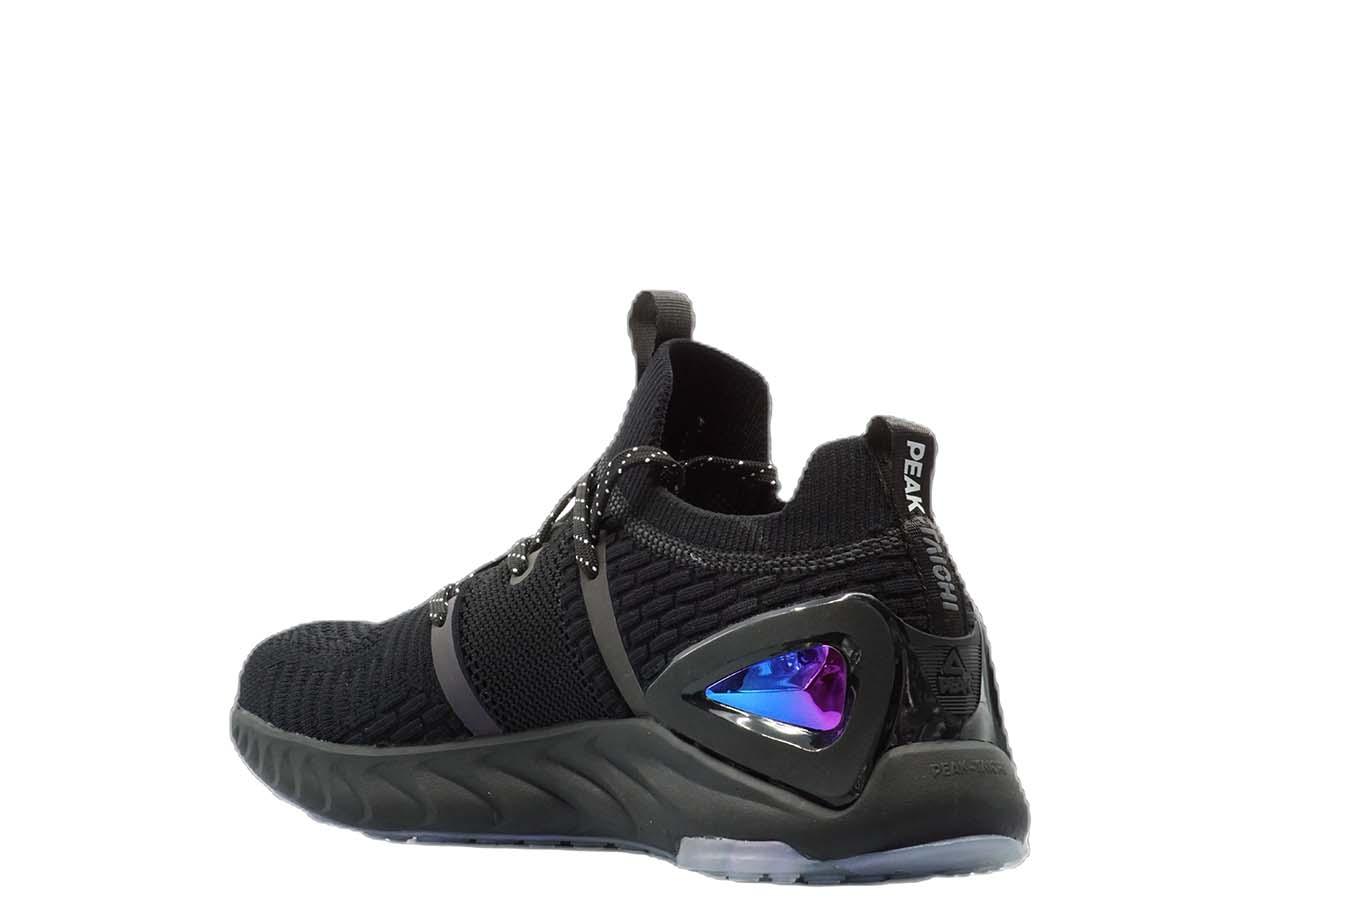 E93577 Mens Peak Taichi x MIB International Black Nebula Running Shoes